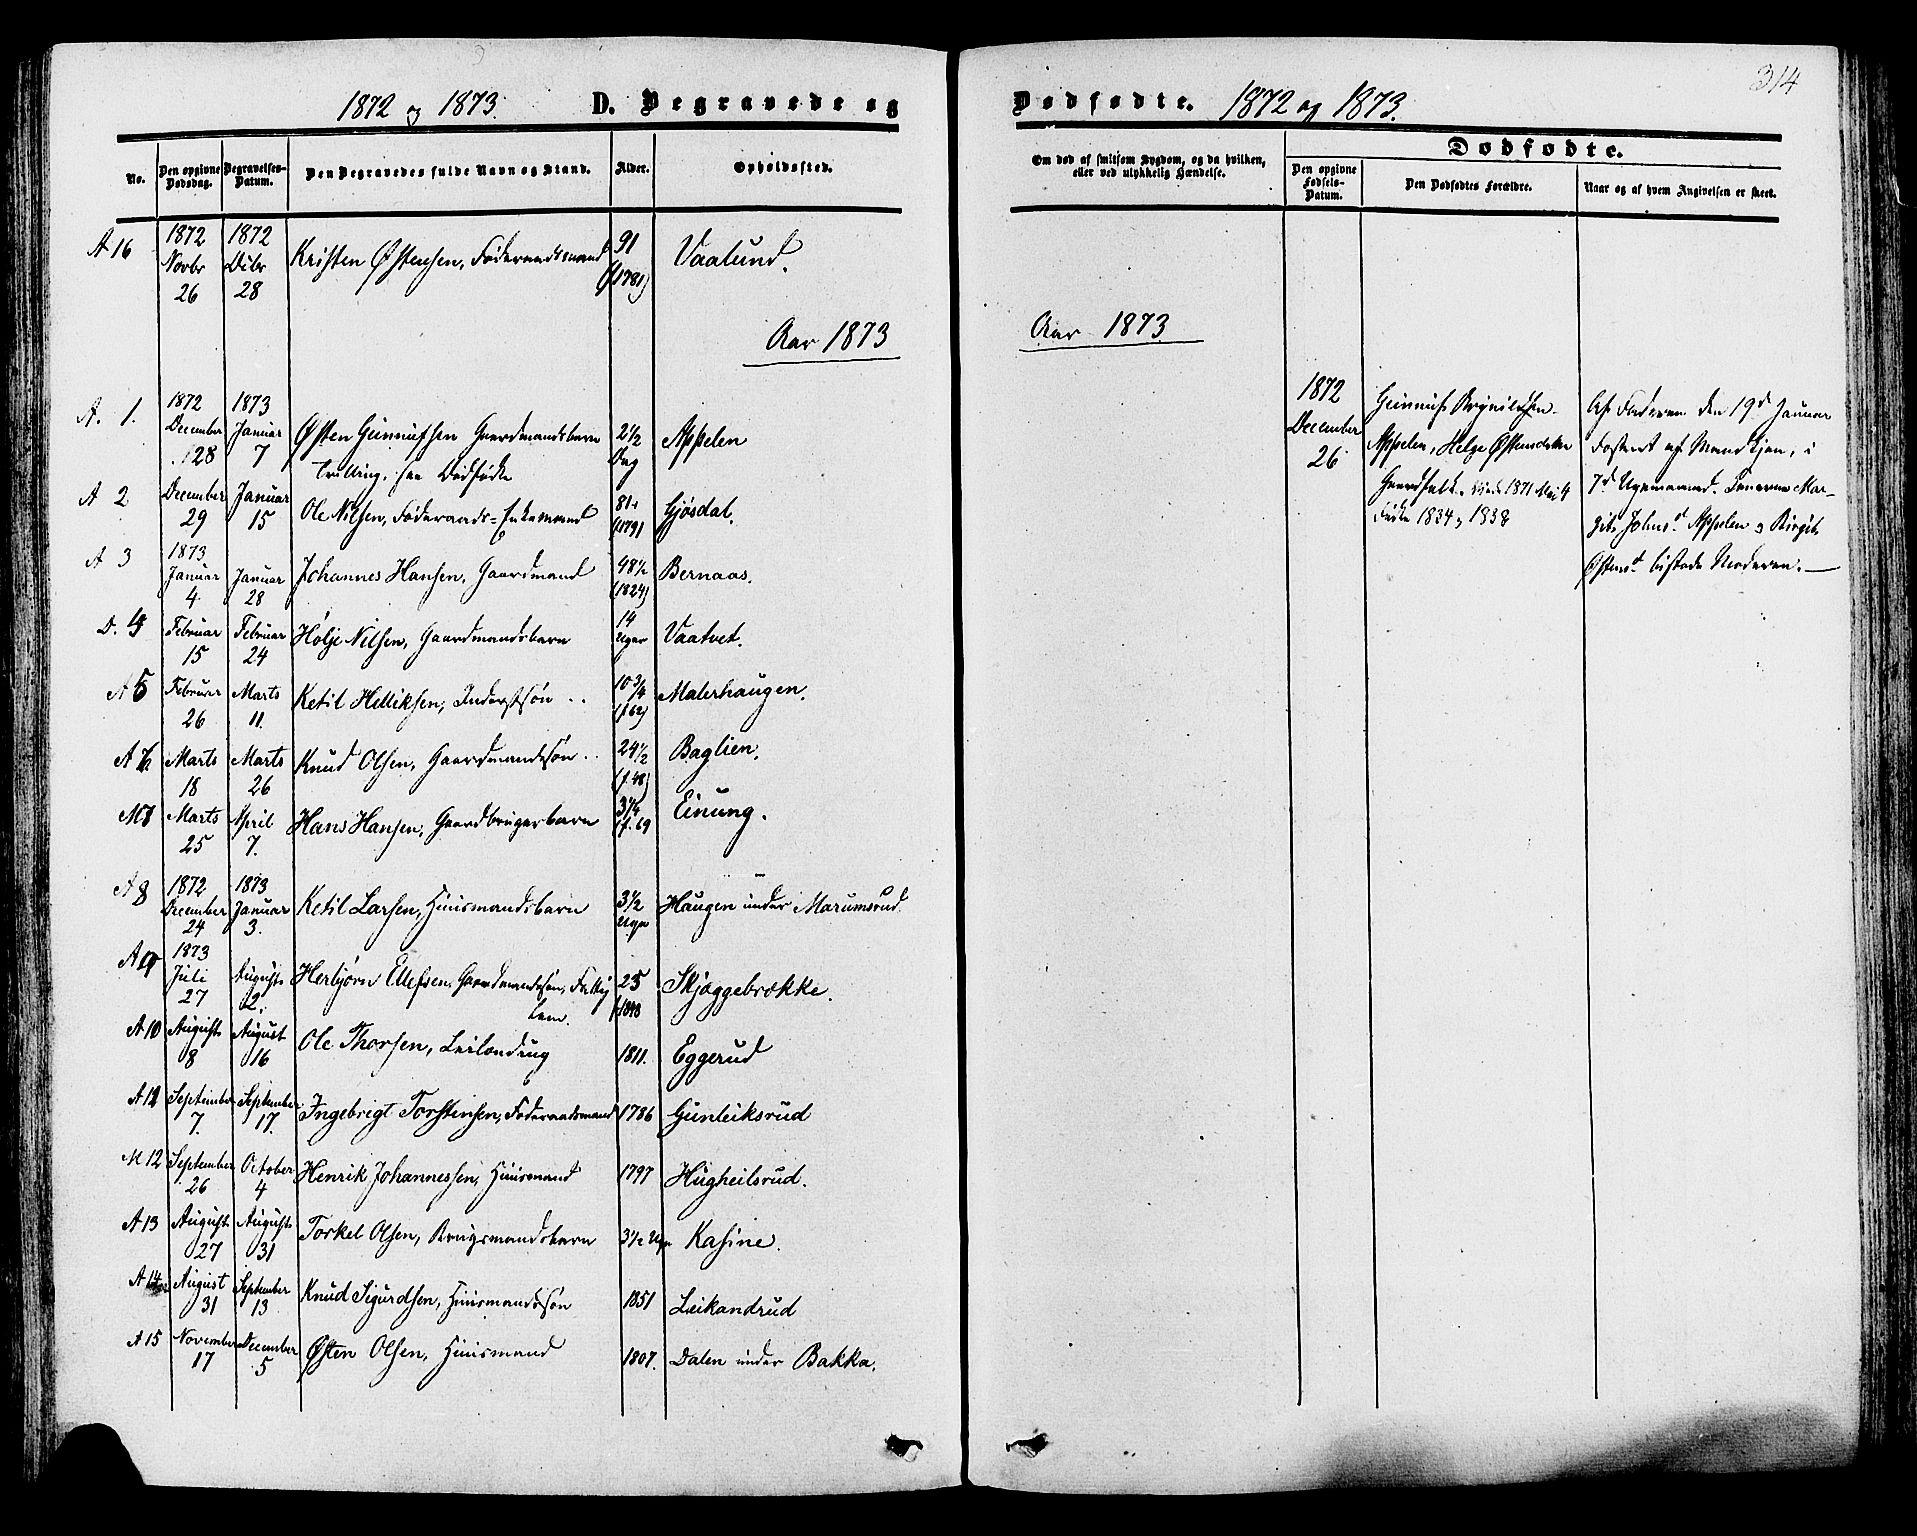 SAKO, Tinn kirkebøker, F/Fa/L0006: Ministerialbok nr. I 6, 1857-1878, s. 314